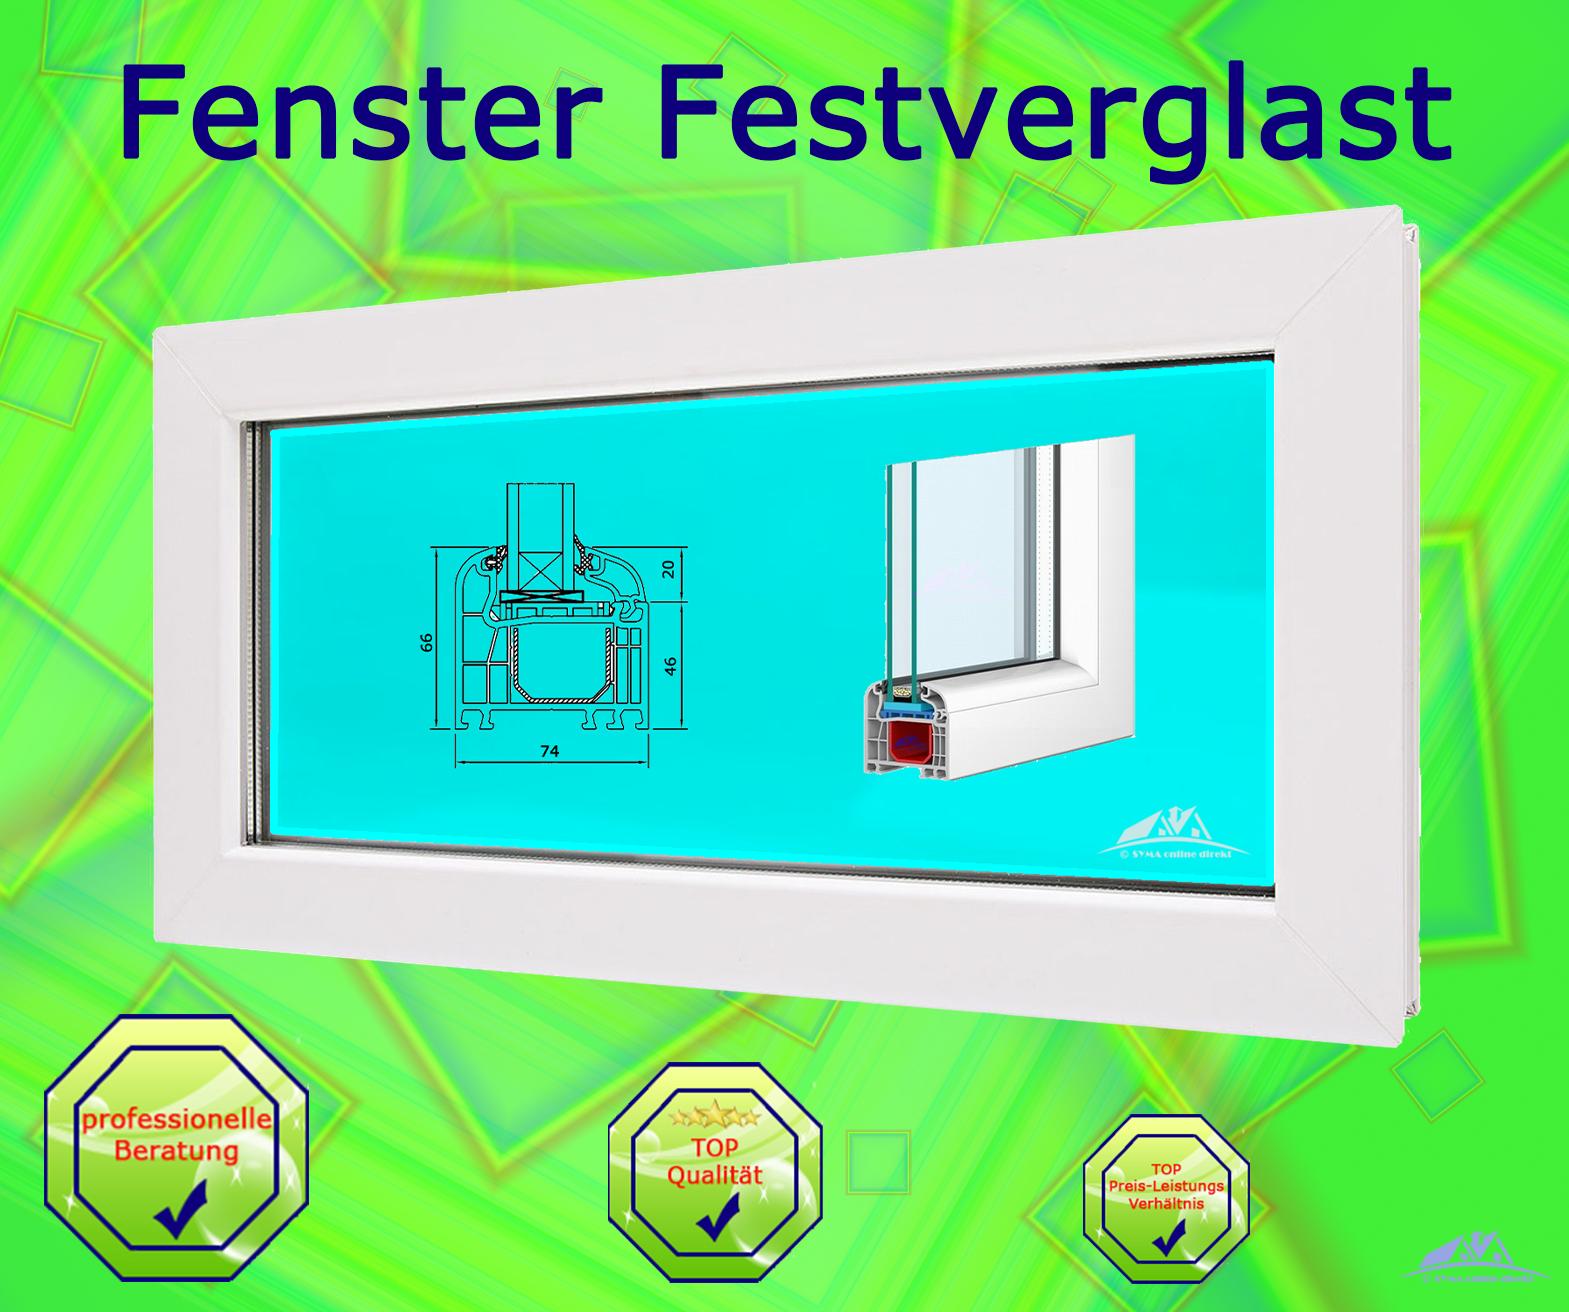 Kunststofffenster Festverglast im Blendrahmen  900 x 700 Breite x Höhe in mm